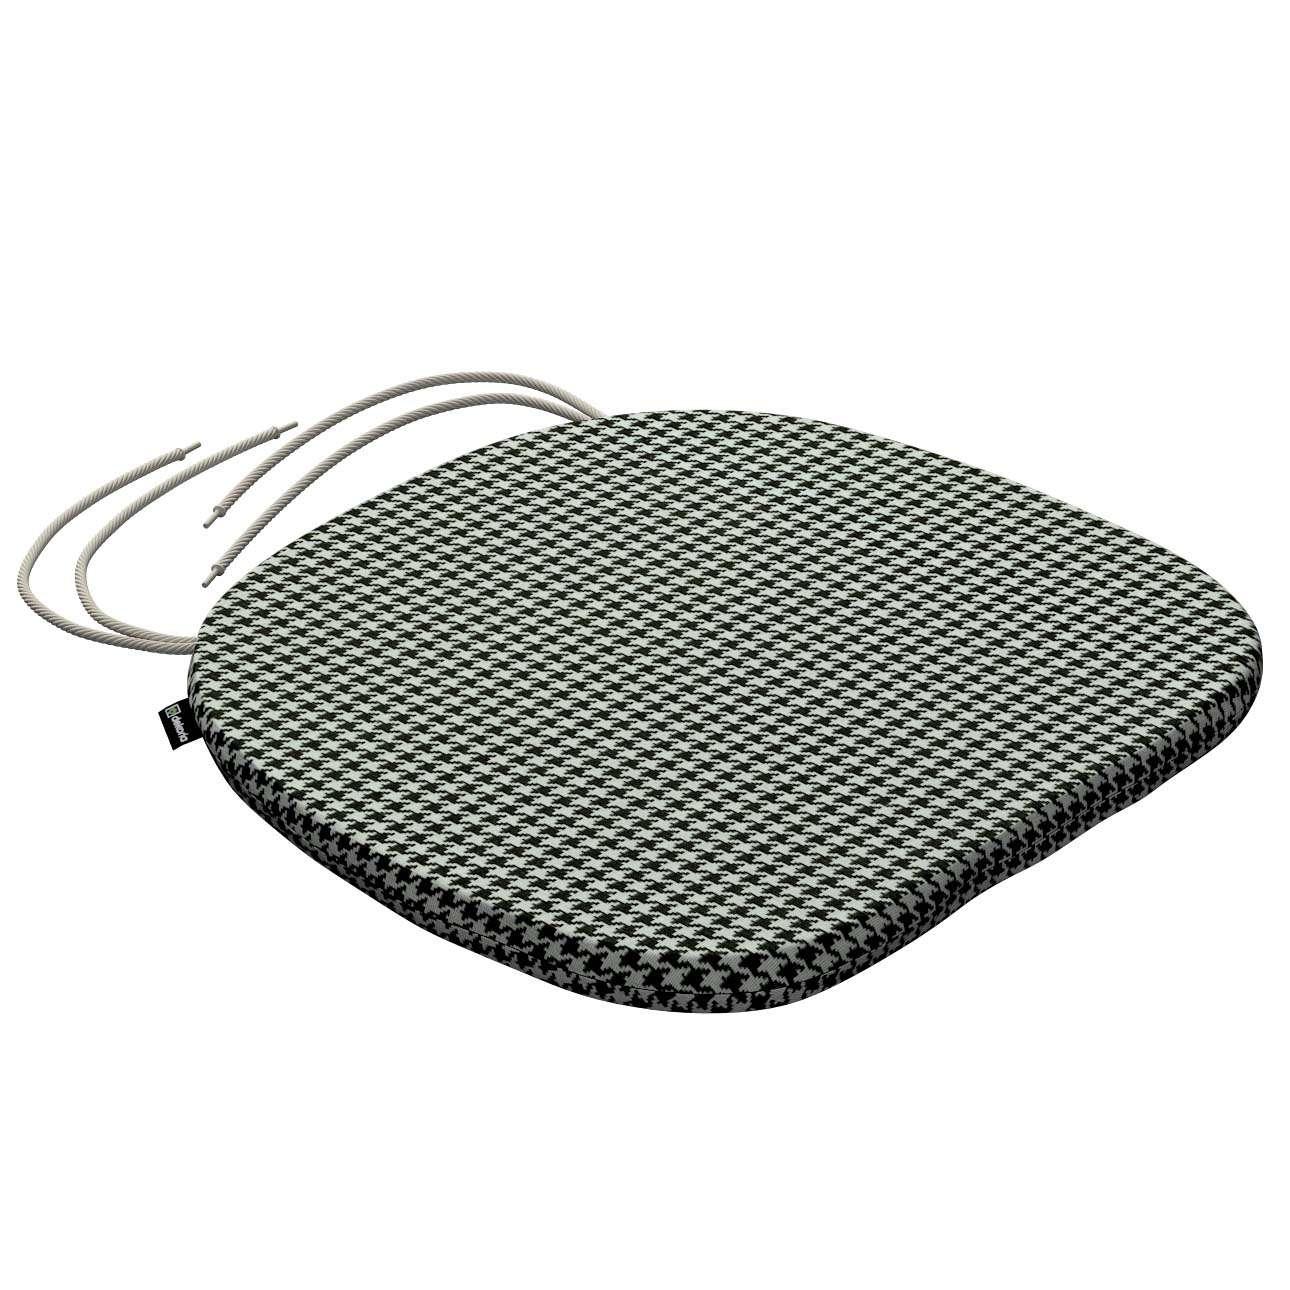 Stolehynde Marcus fra kollektionen Black & White, Stof: 142-77